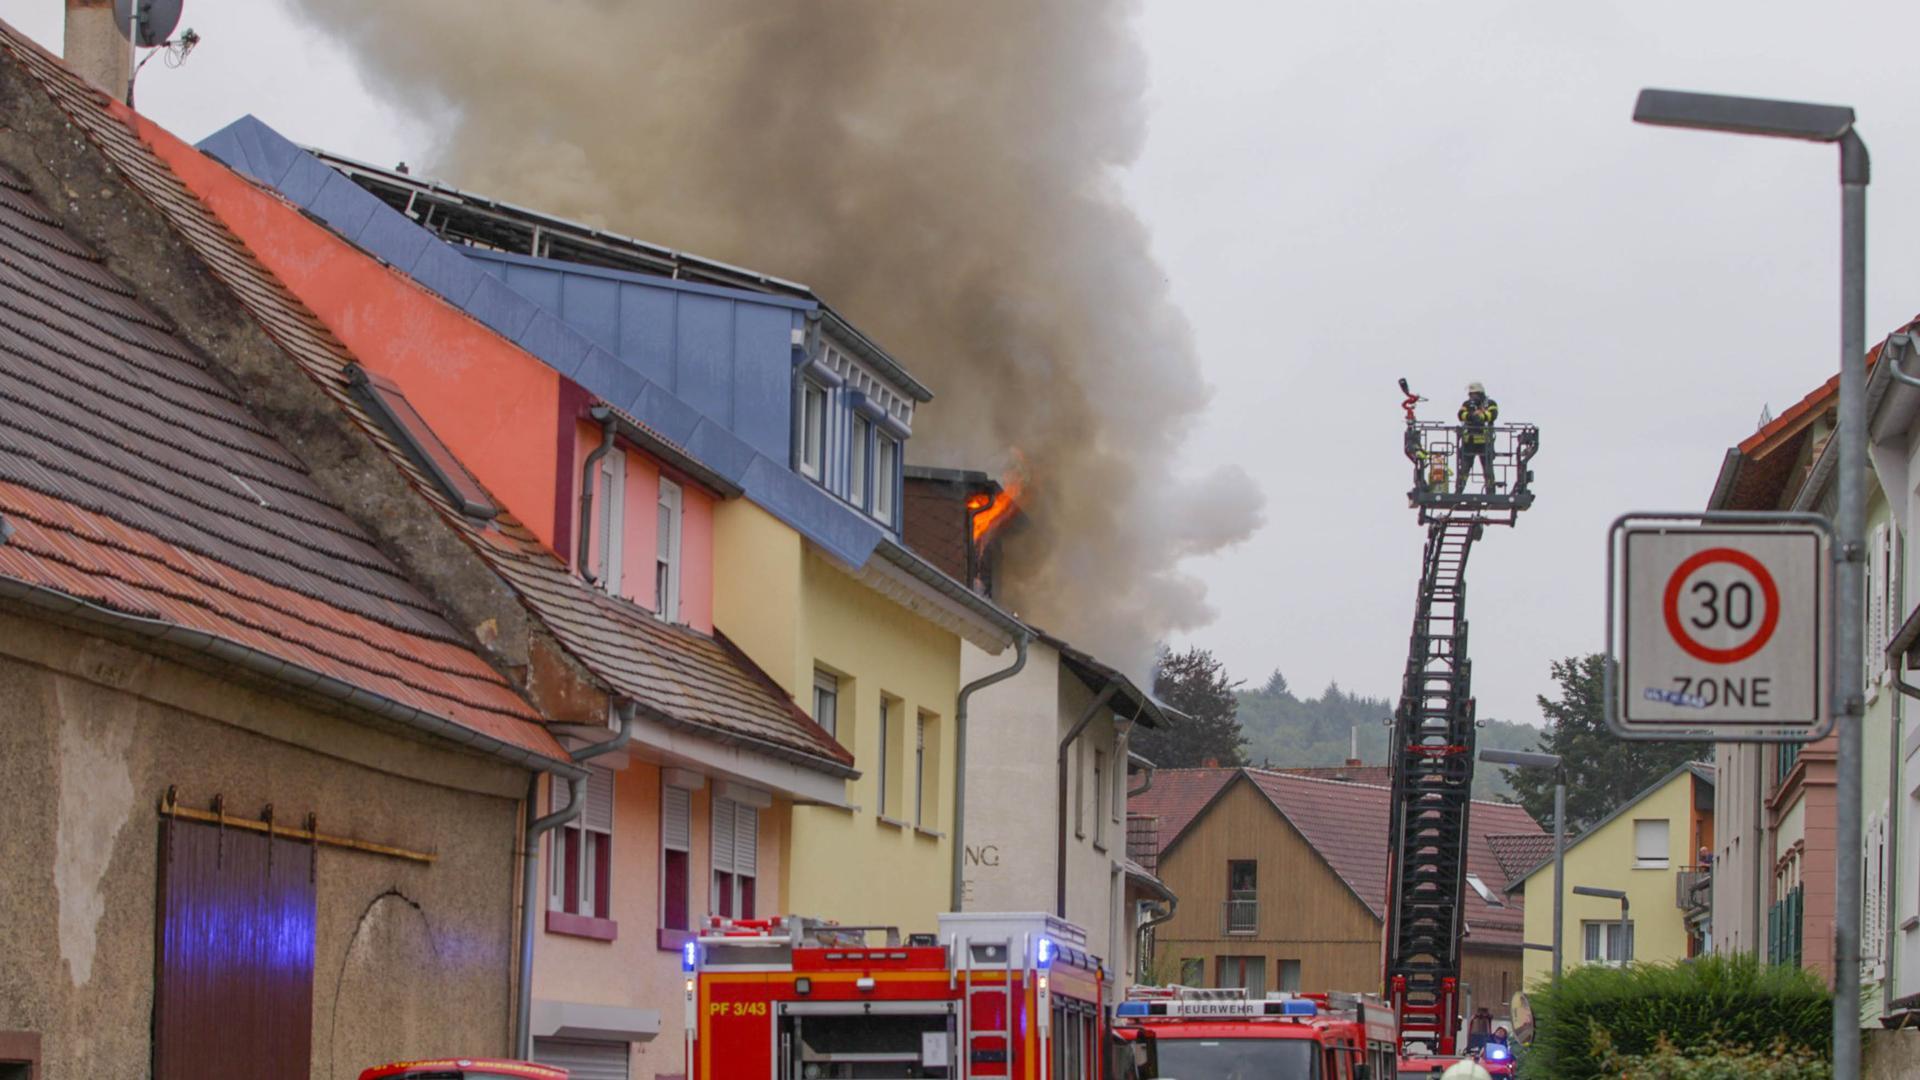 Dachstuhlbrand in Mehrfamilienhaus in Pfinztal-Söllingen